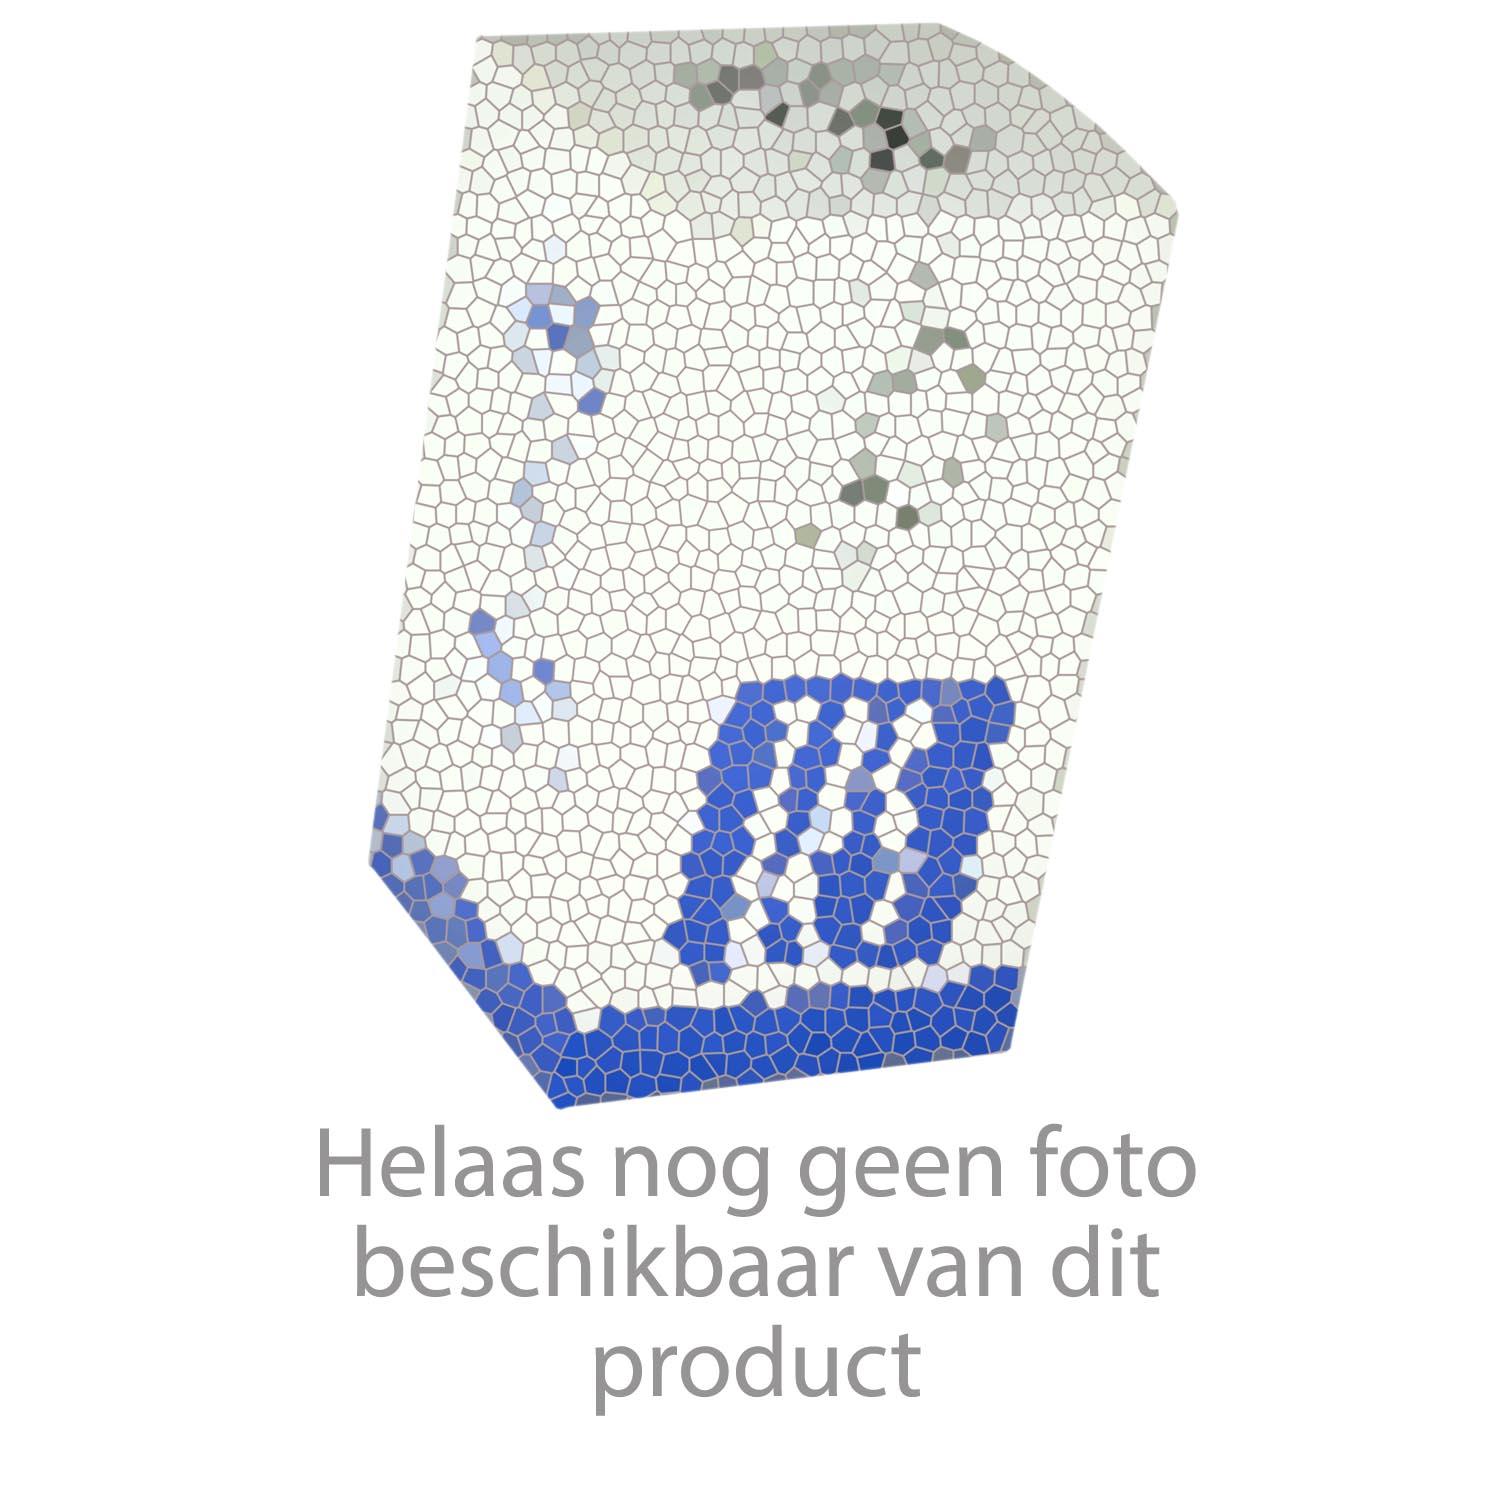 Echtermann TopClean wandmodel met thermostaat tussenkraan op stijgpijp (h.o.h. 15cm) Artikel nummer 6448